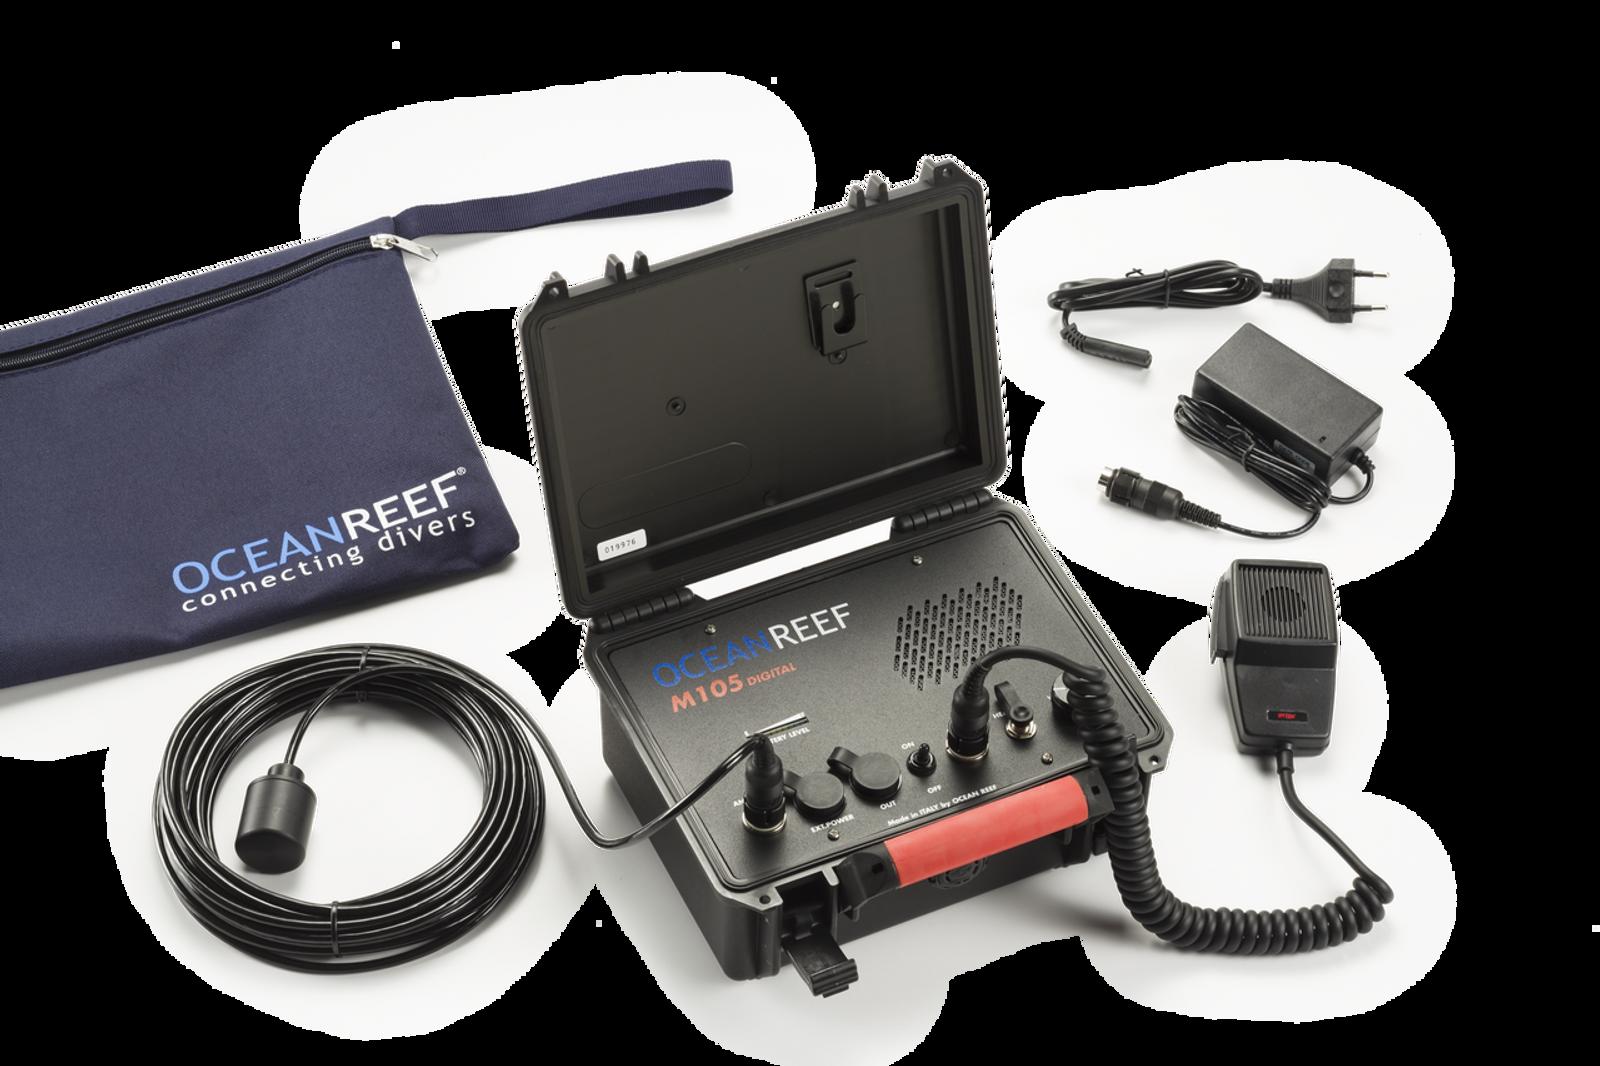 M-105 Digital Transceiver Surface Unit W/battery tester